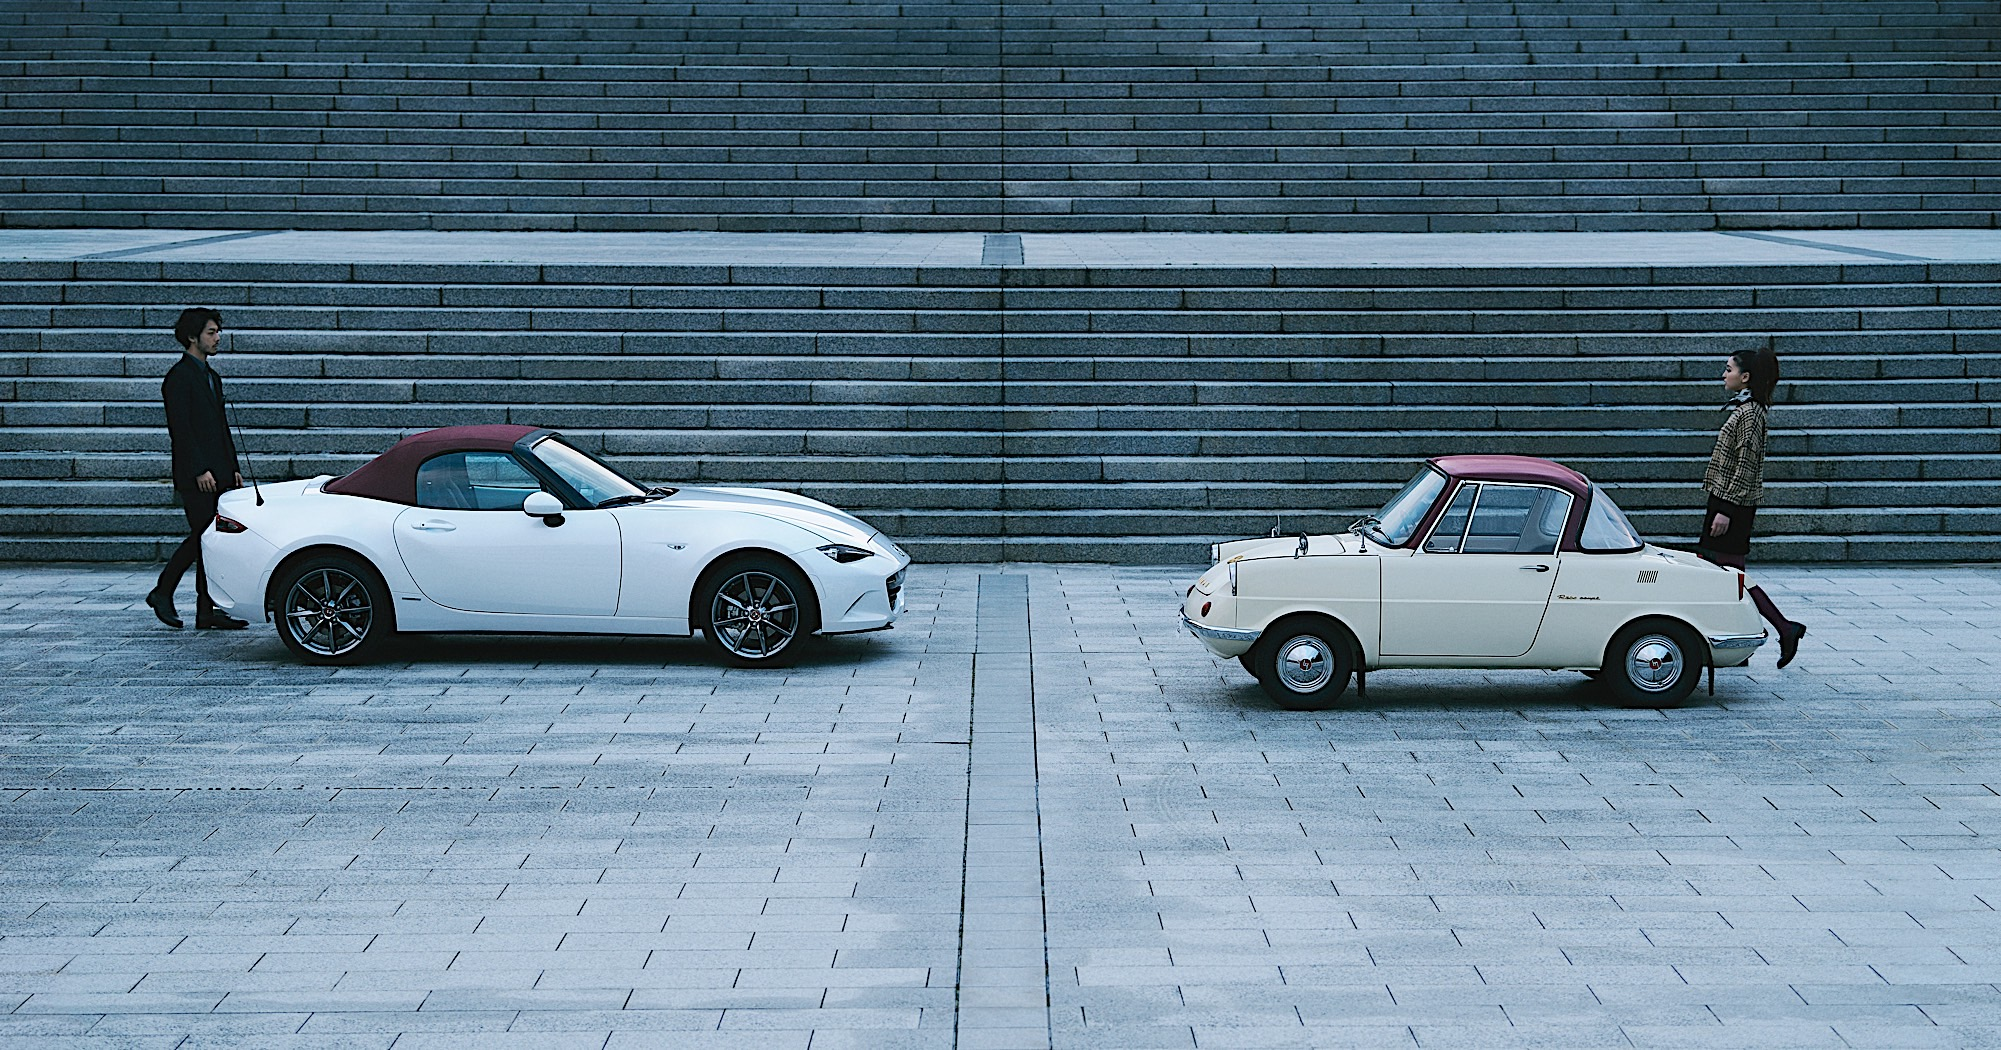 2021 Mazda Mx 5 Miata Engine